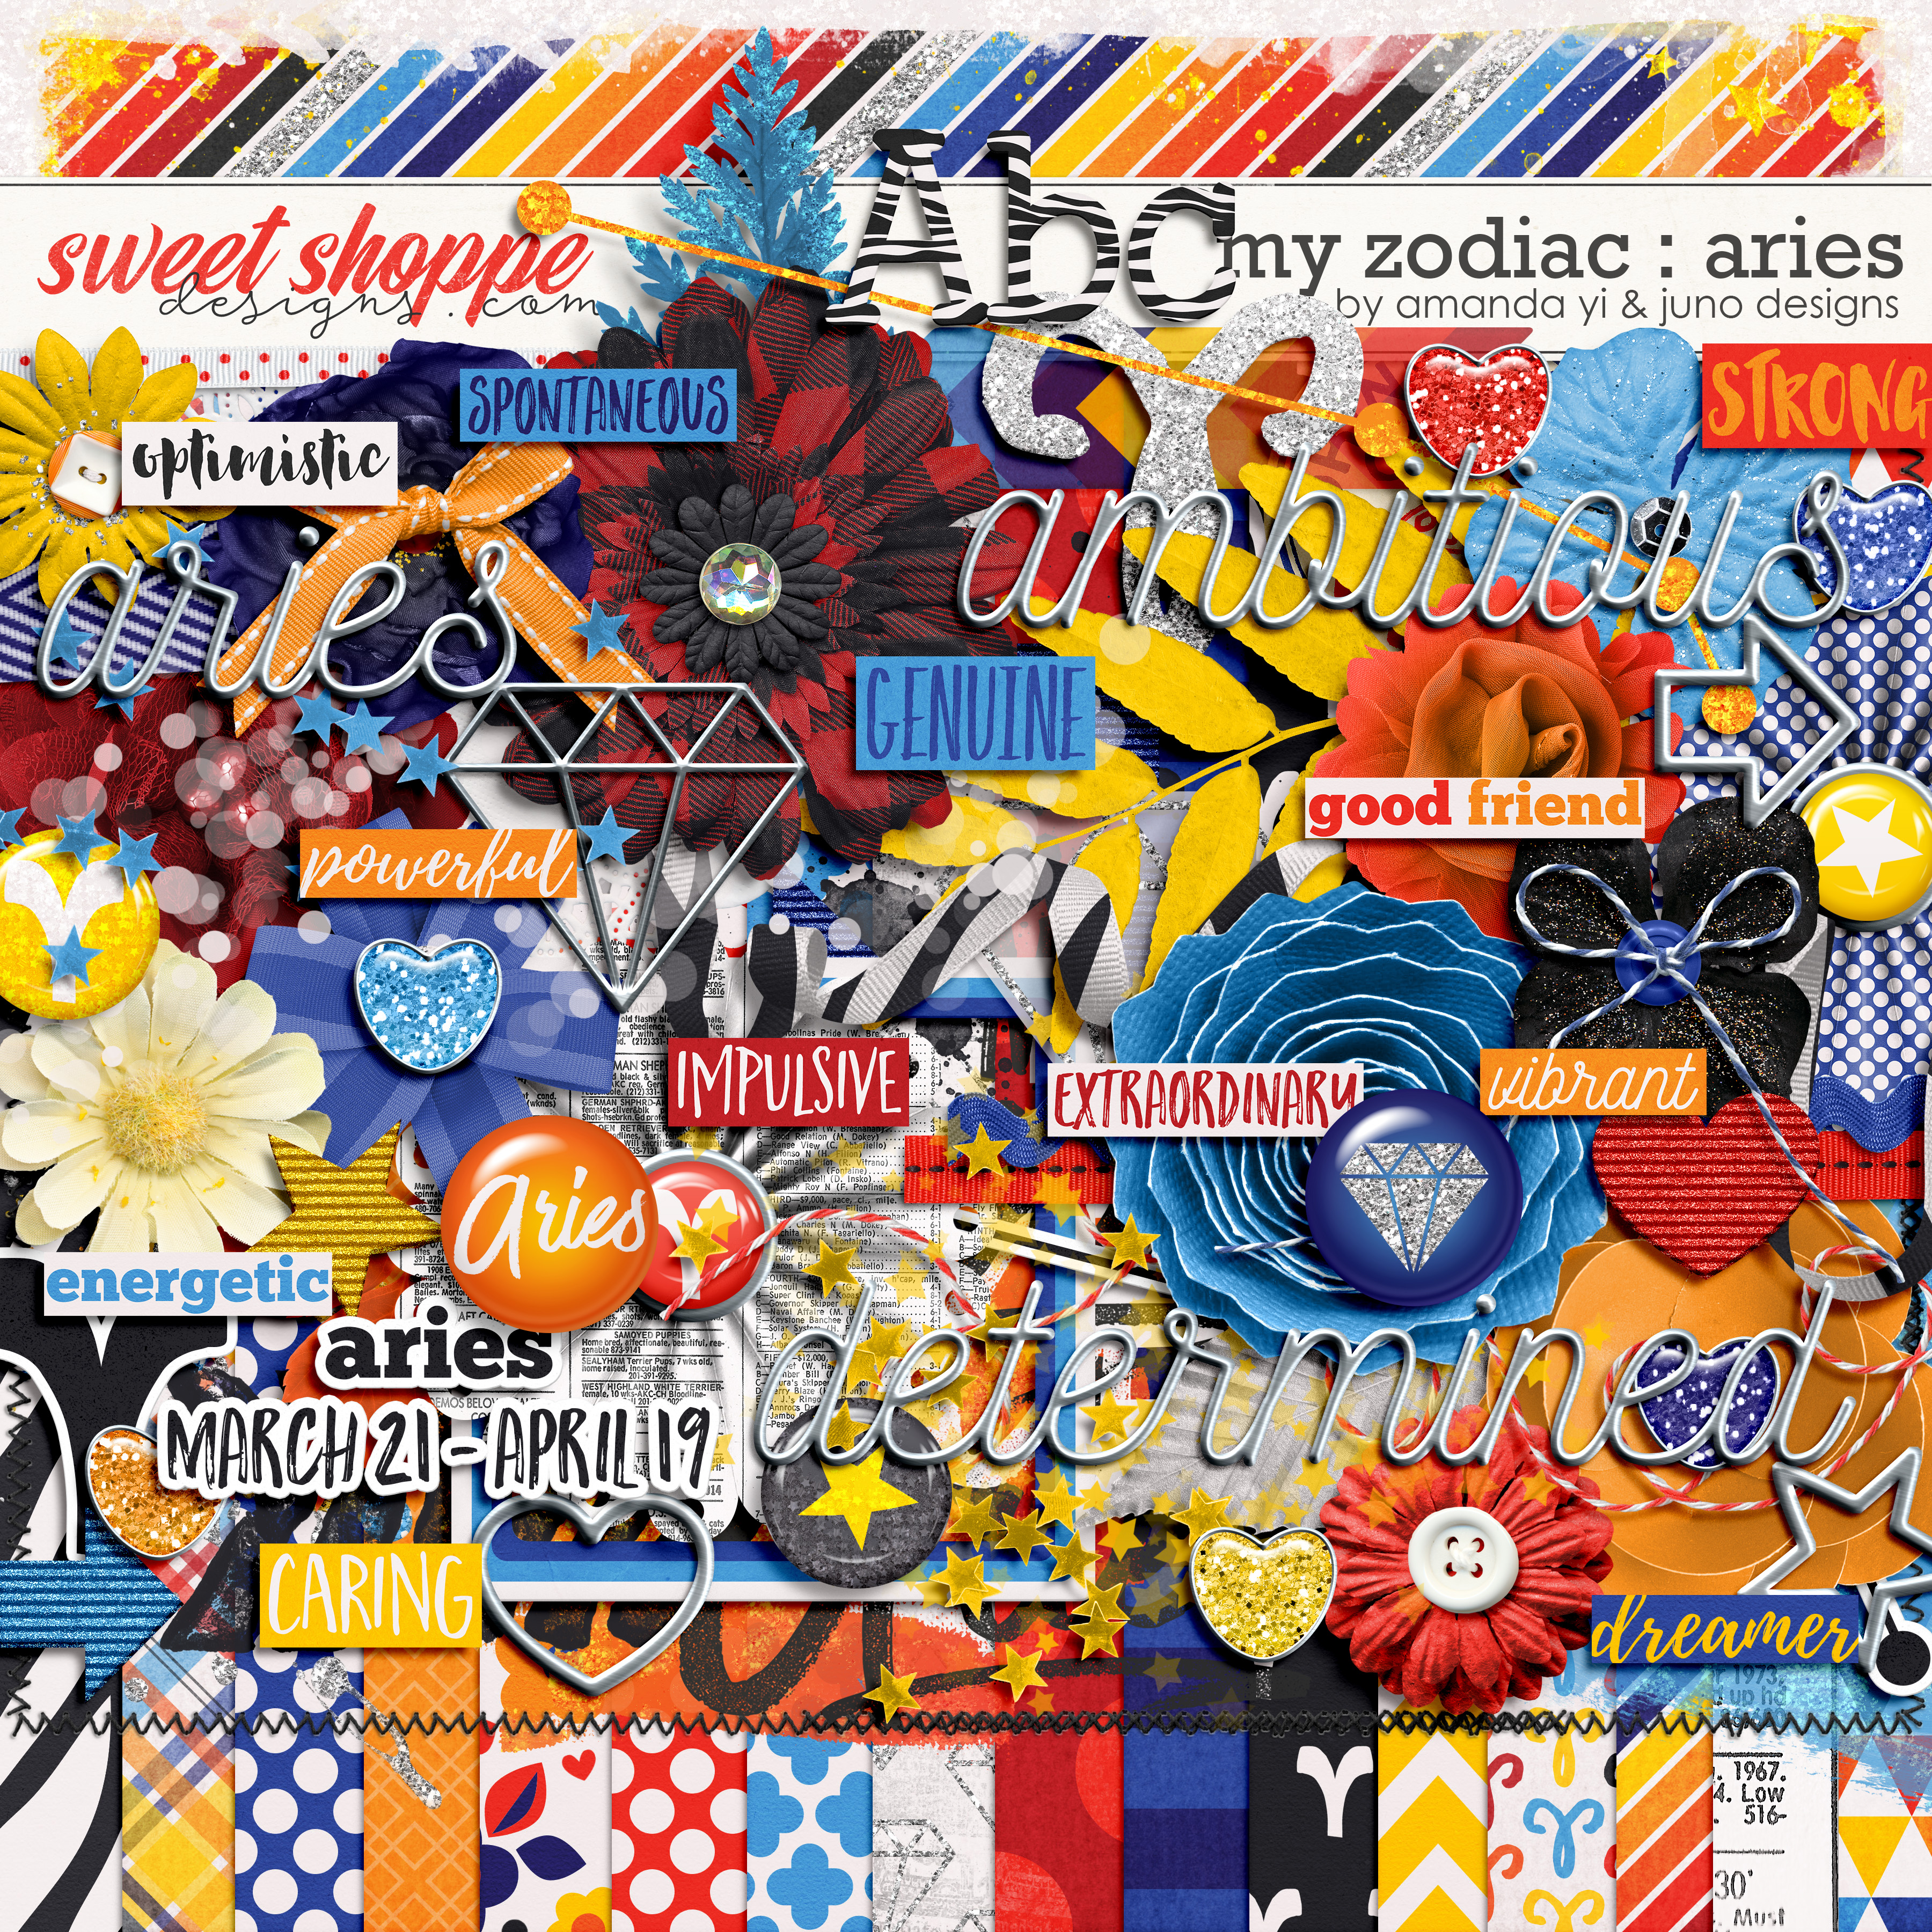 My Zodiac - Aries by Amanda Yi & Juno Designs